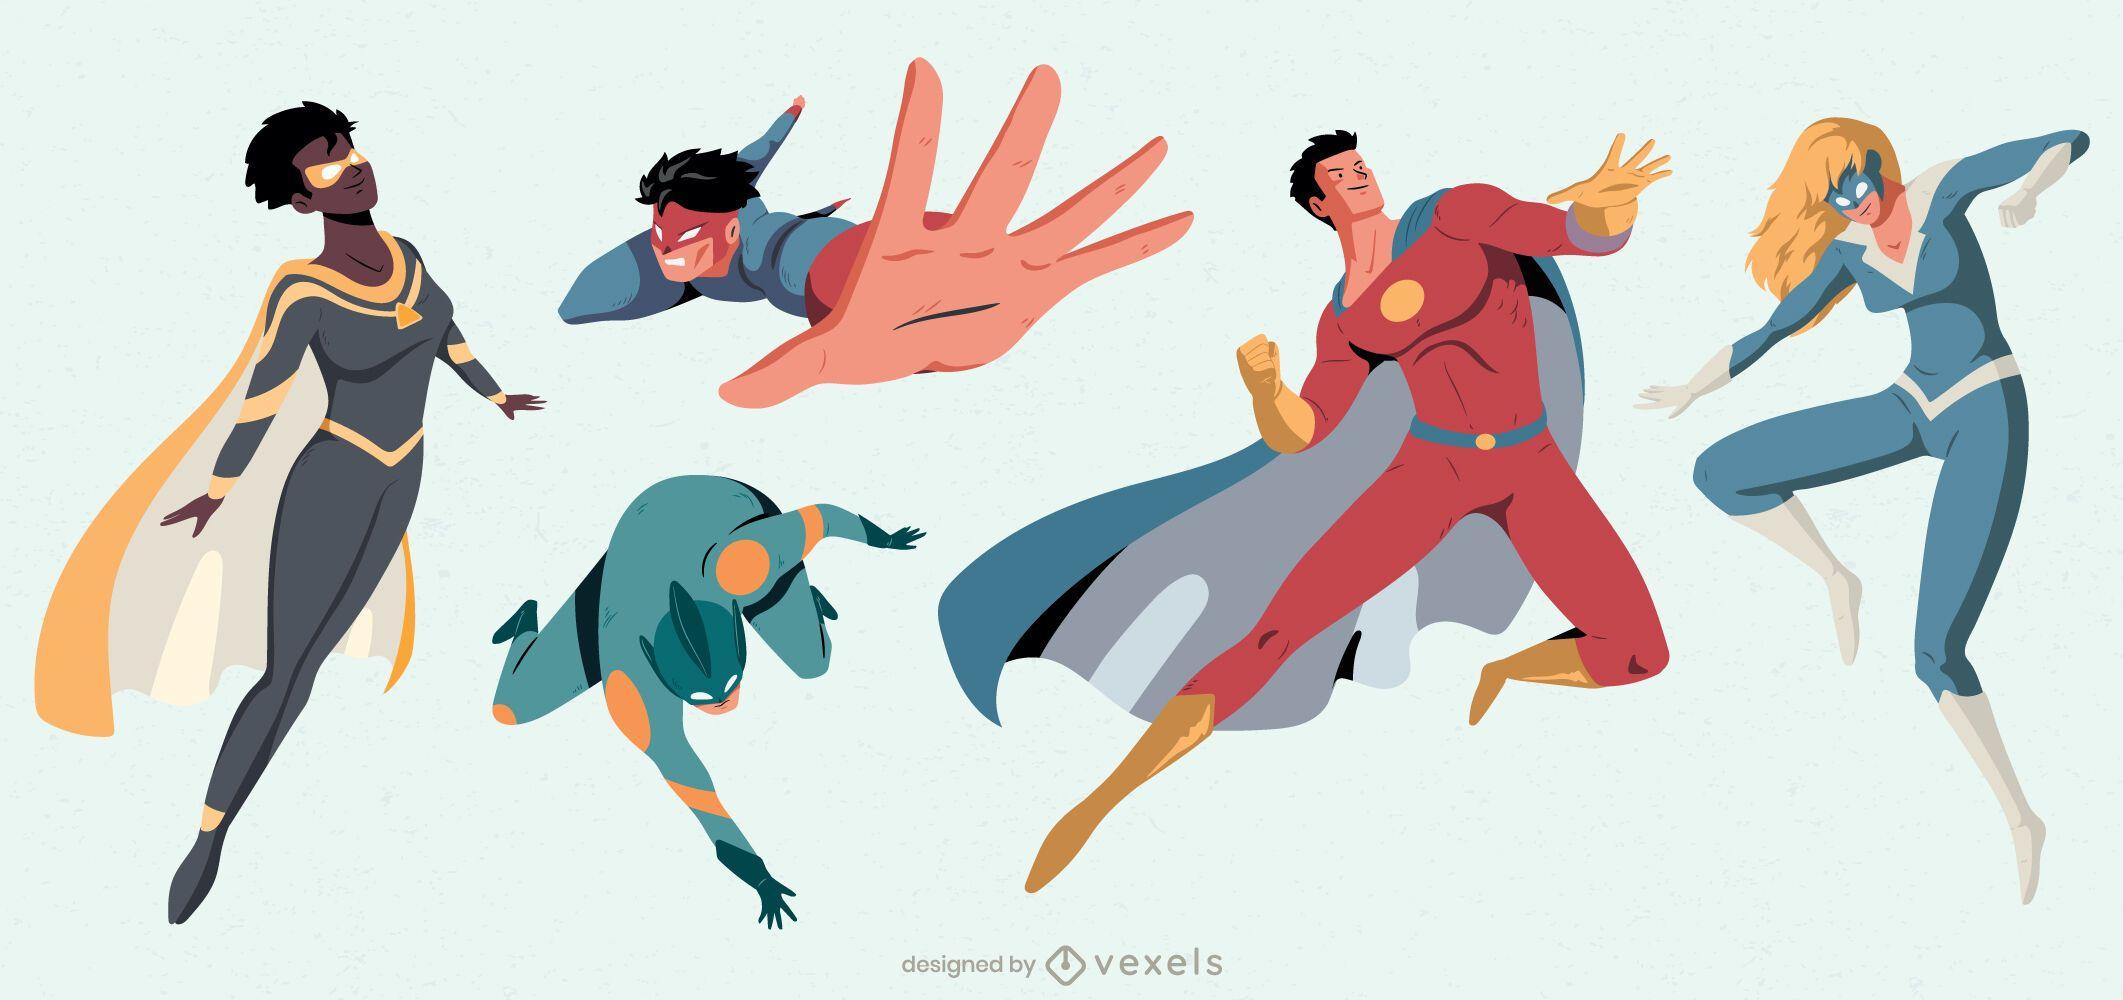 Superhero character pack